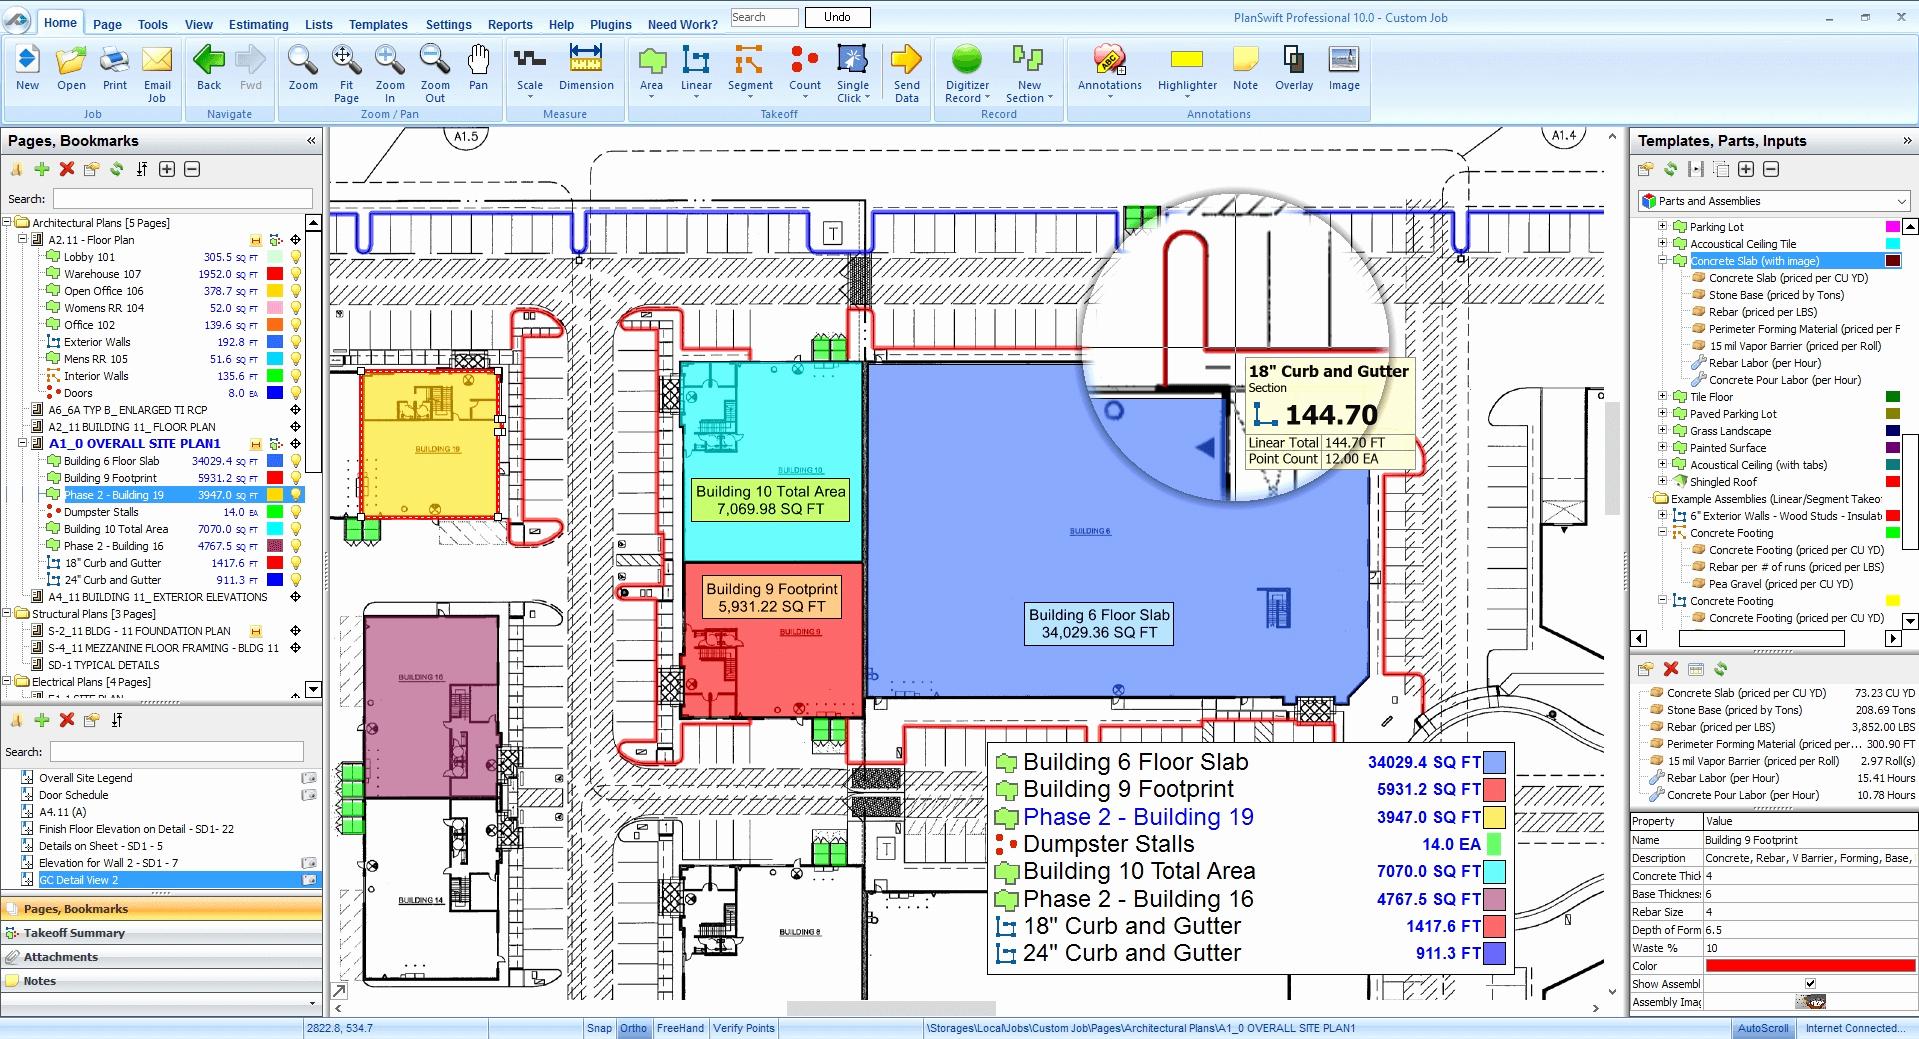 Building Construction Estimate Spreadsheet Excel Download Best Of within Building Construction Estimate Spreadsheet Excel Download